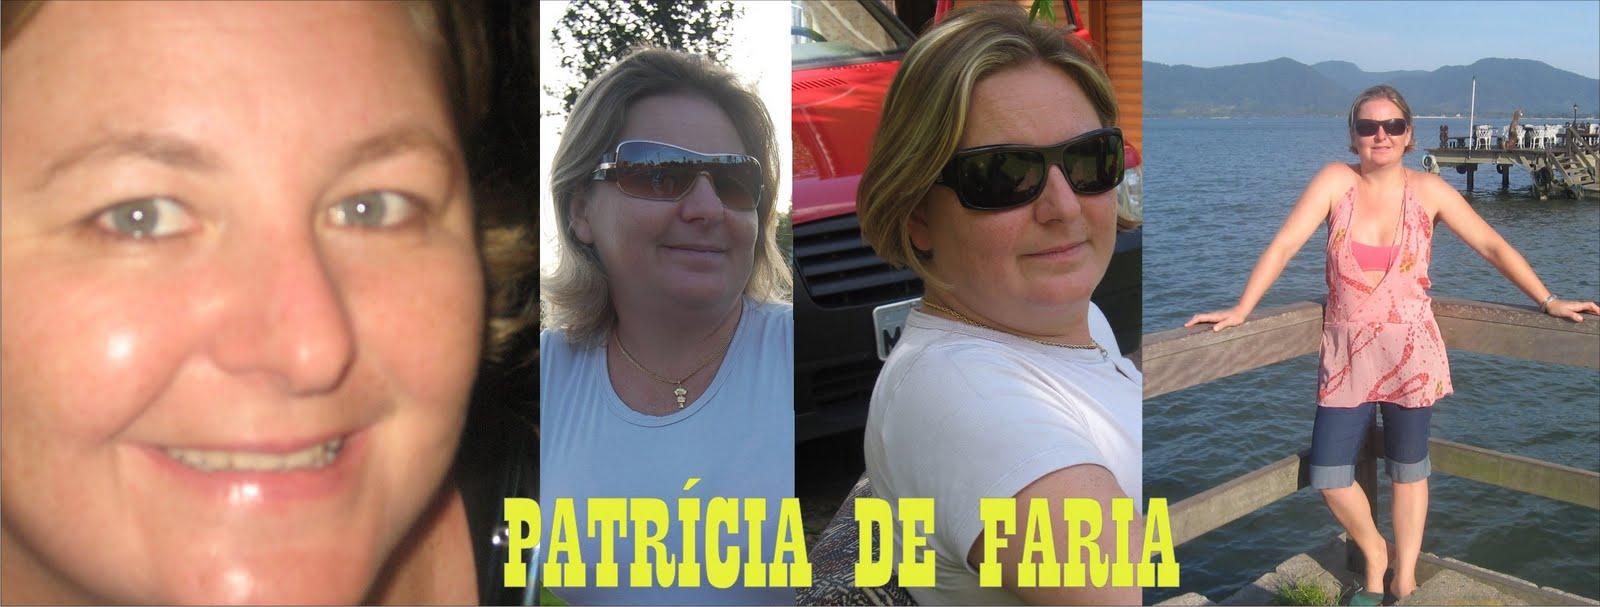 Patrícia de Faria